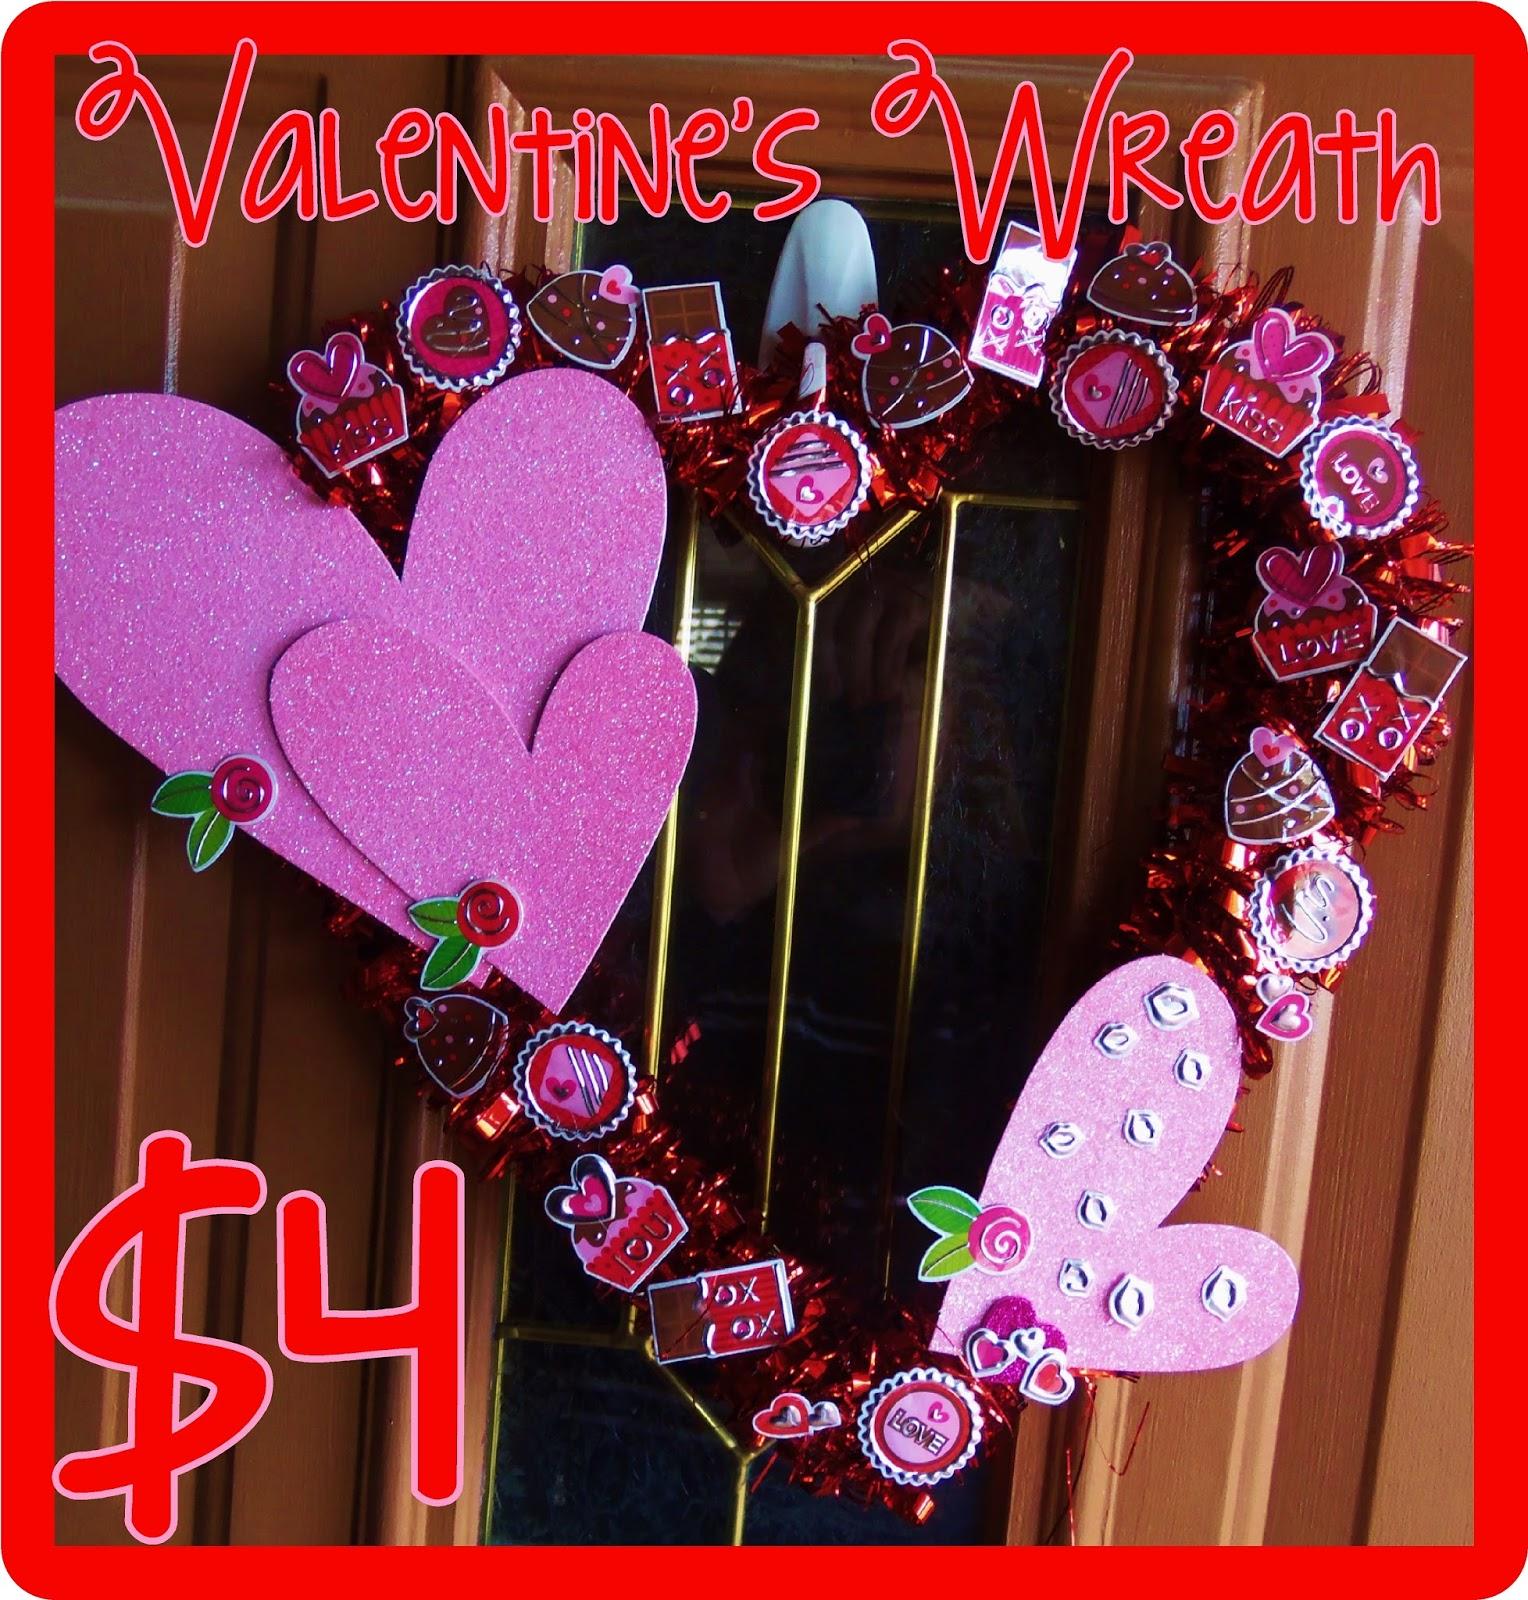 http://hollyshome-hollyshome.blogspot.com/2014/02/a-four-dollar-valentines-wreath.html